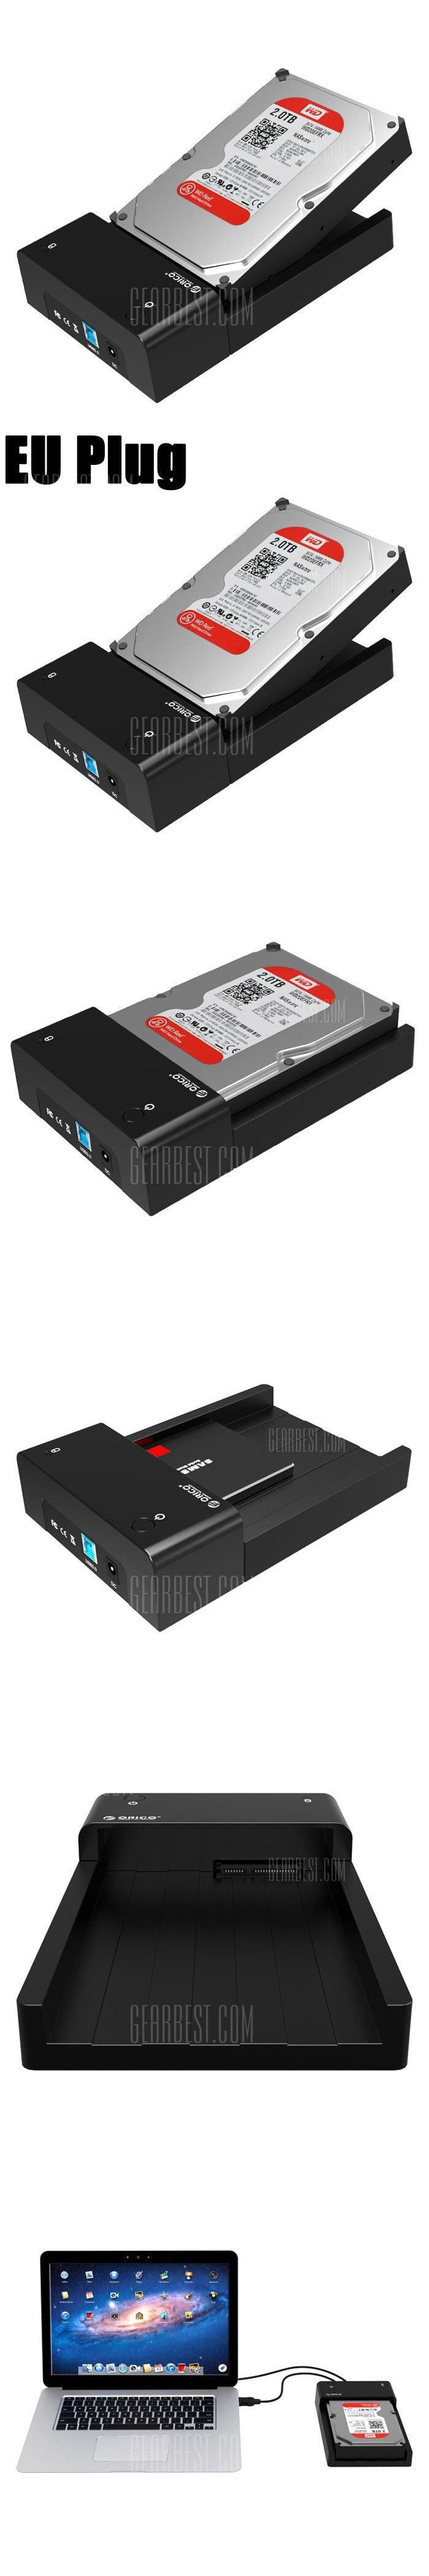 Orico 6518us3 V1 Usb 30 Hard Disk Drive Enclosure Case Portable Docking Usb30